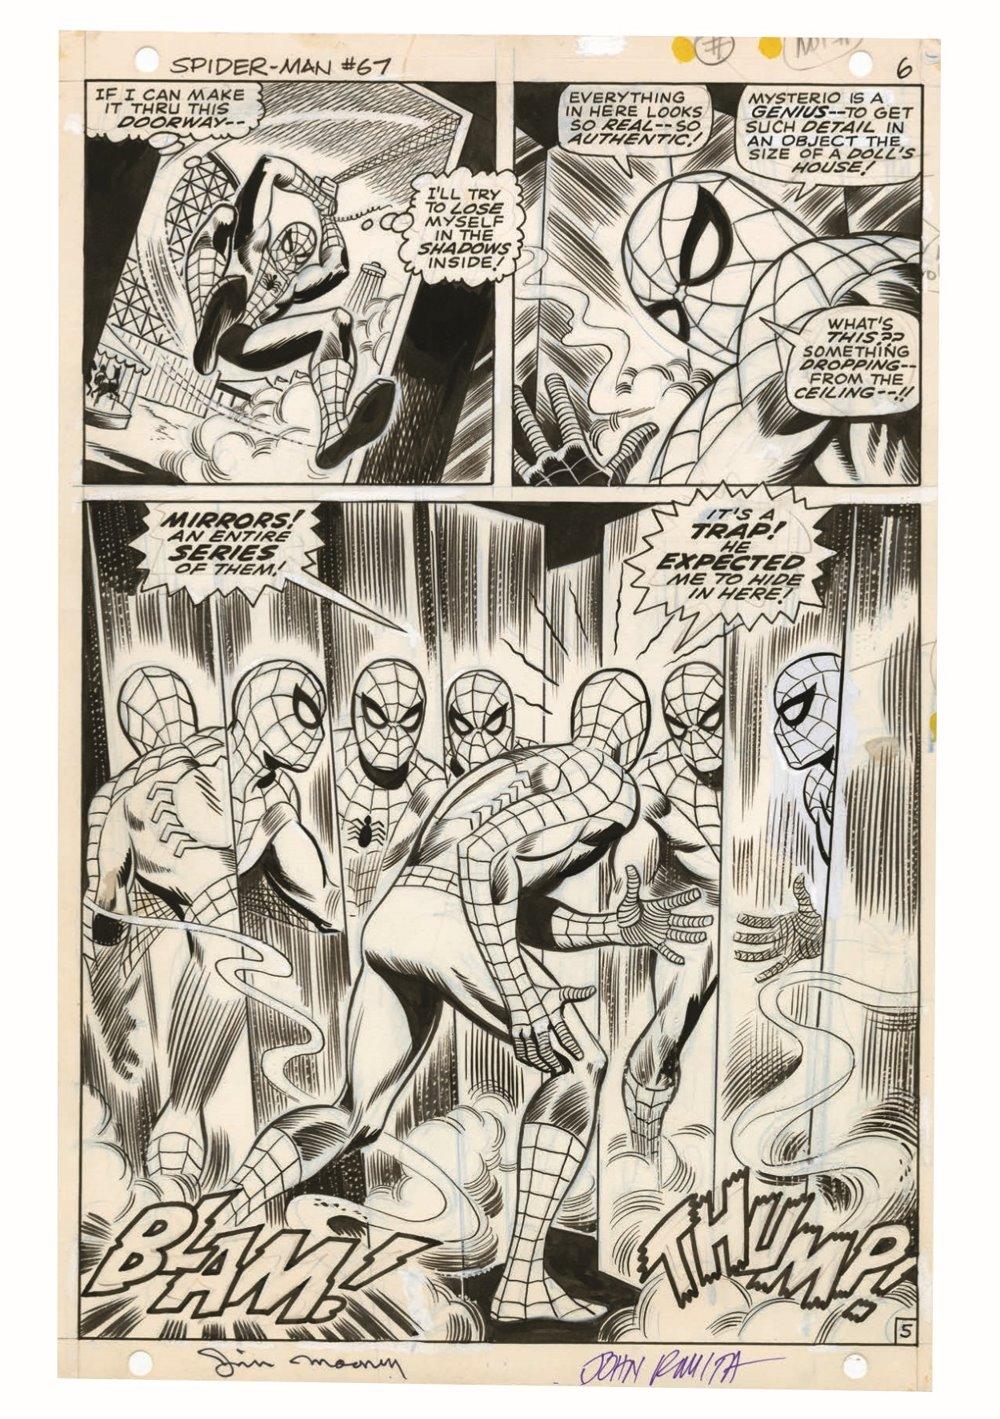 JohnRomita_Spidermand_Artisan_pr-7 ComicList Previews: JOHN ROMITA'S THE AMAZING SPIDER-MAN ARTISAN EDITION TP